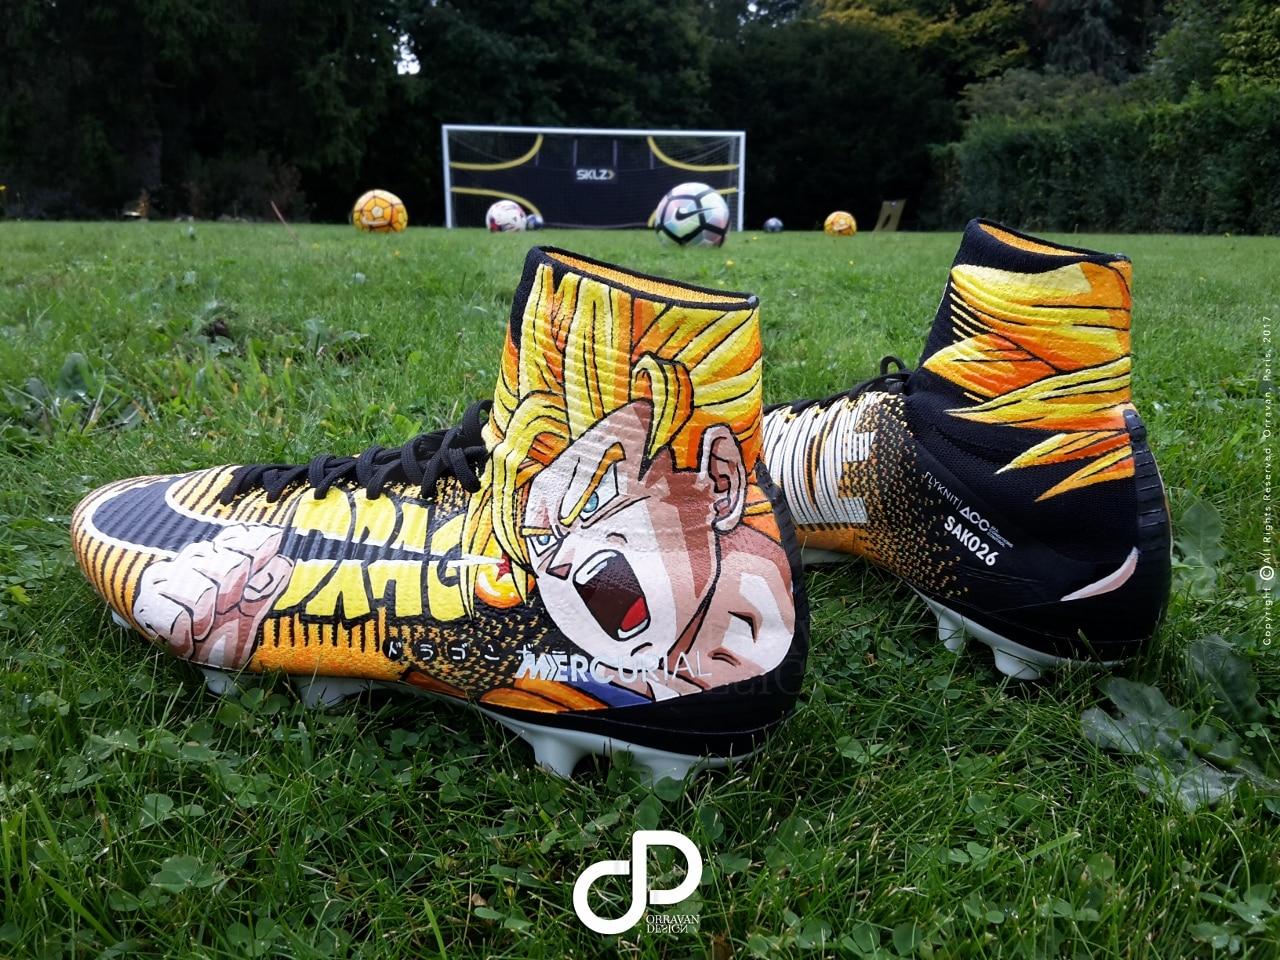 "f4b719da0 Custom Nike Mercurial ""MANGA"" Bakary Sako by Orravan Design ..  Linternational malien a même joué le week-end dernier avec sa paire de  Mercurial Superfly . ..."